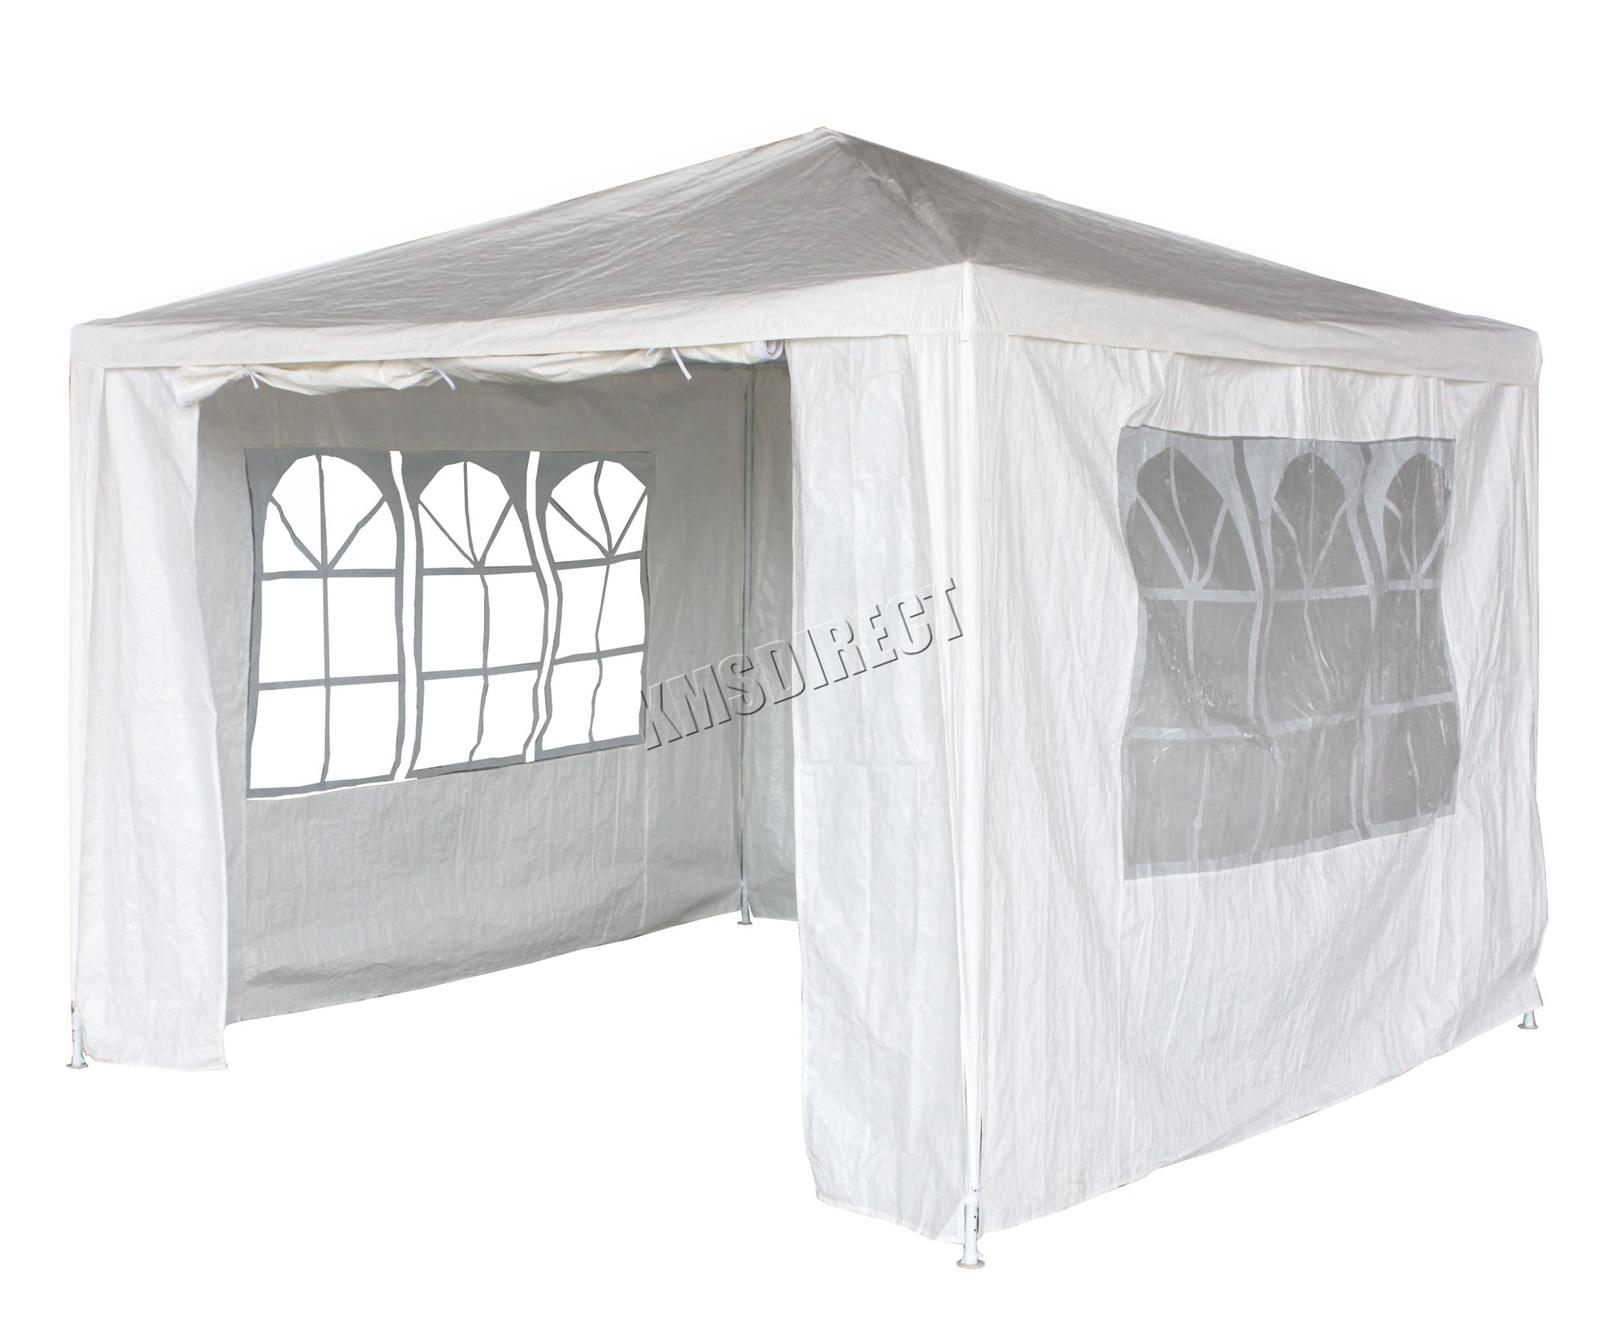 New-3-x-3m-120g-Waterproof-Outdoor-PE-Garden-Gazebo-Marquee-Canopy-Party-Tent Indexbild 25